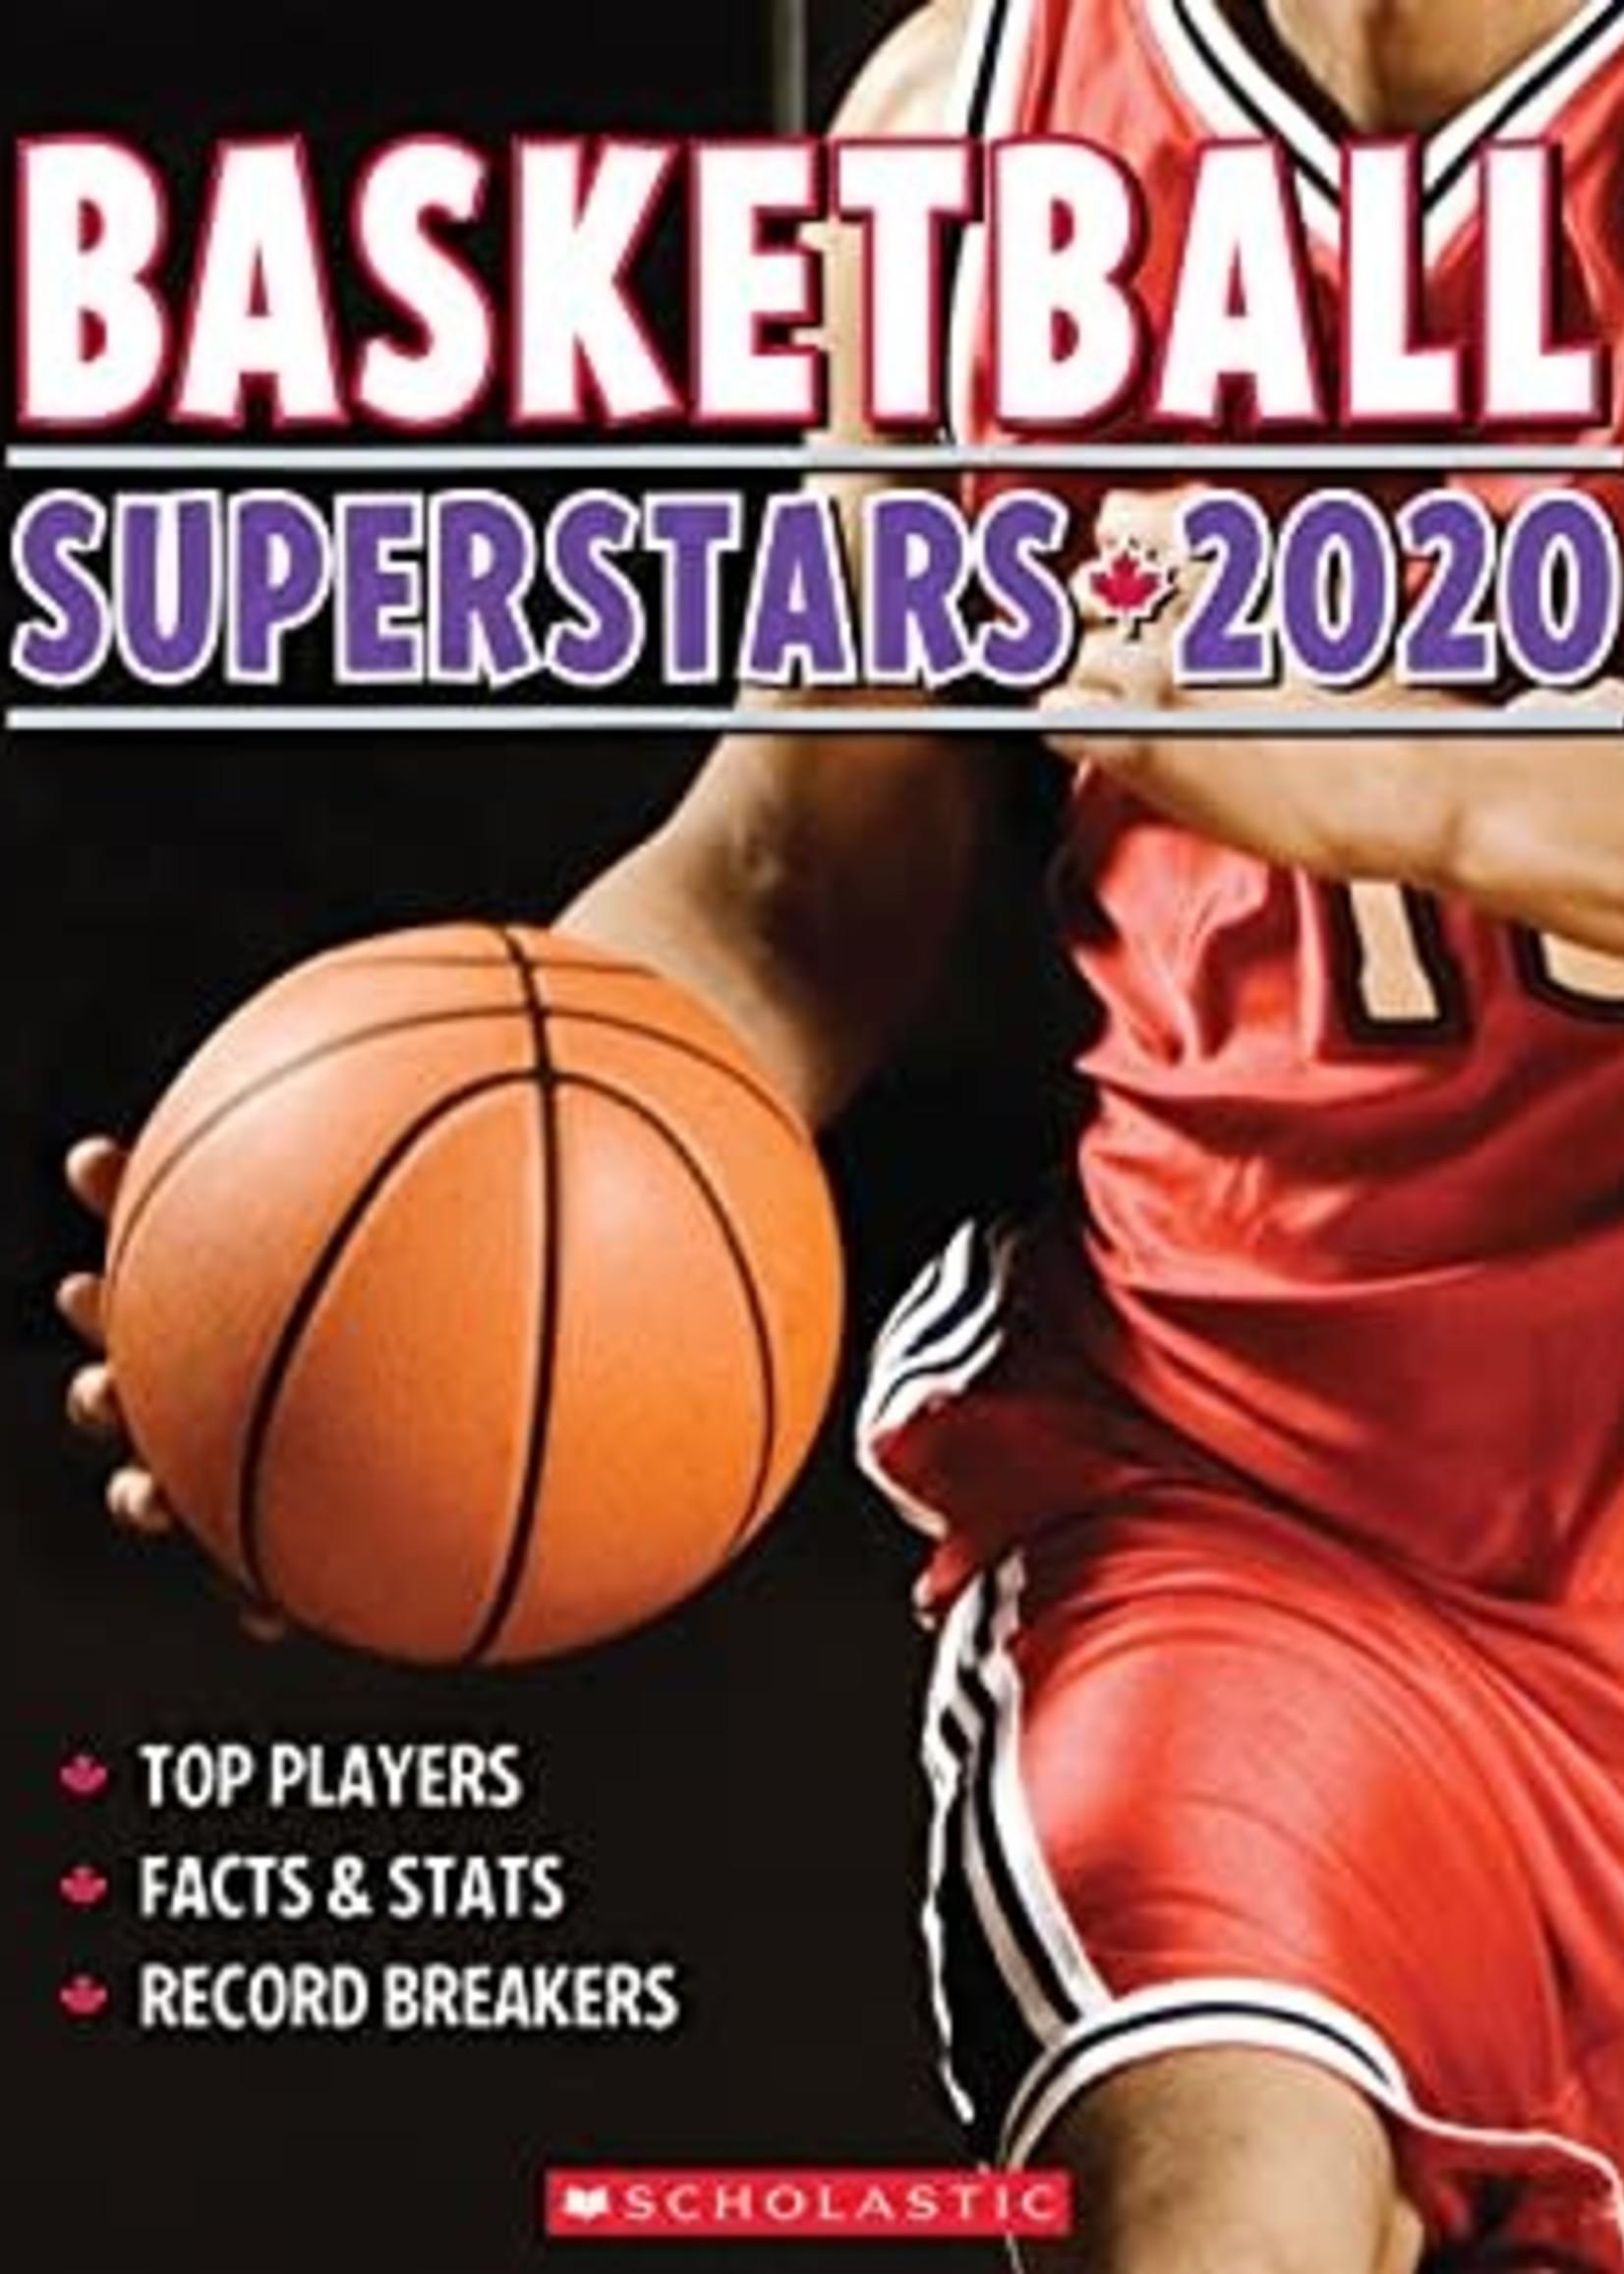 Basketball Superstars 2020 by K.C. Kelley